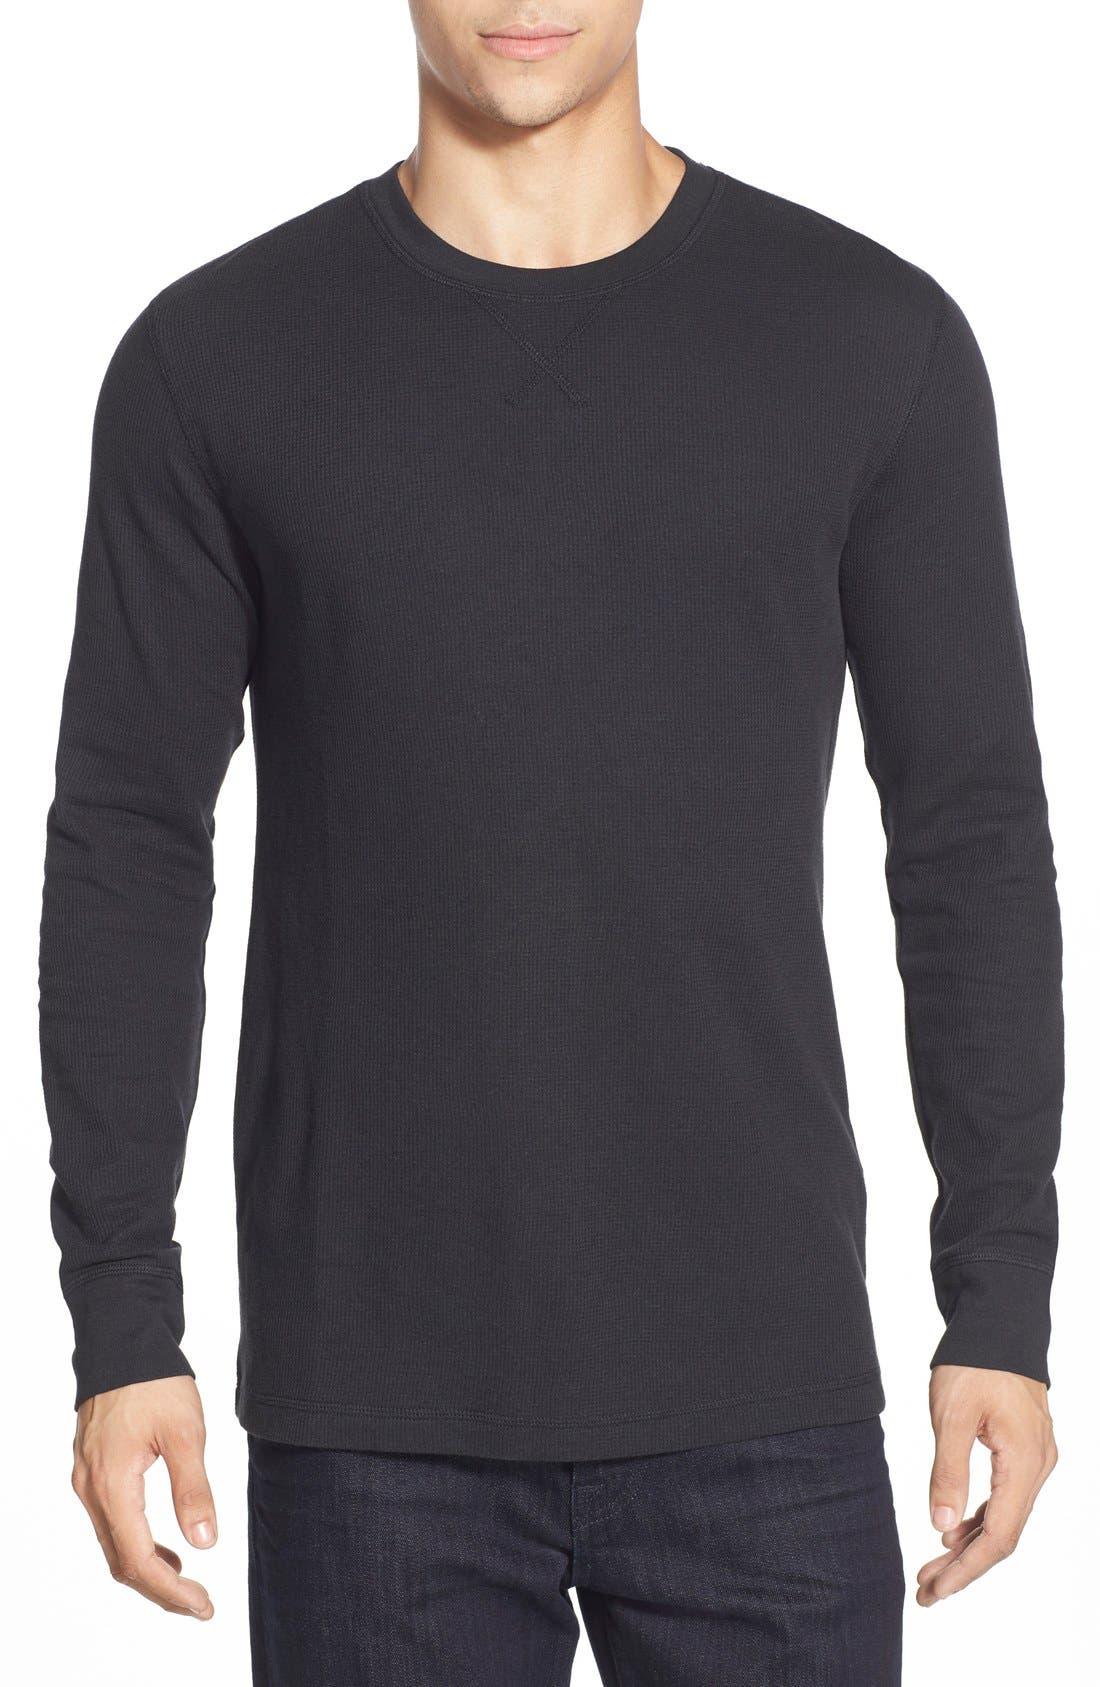 Main Image - Nordstrom Men's Shop Waffle Knit Long Sleeve T-Shirt